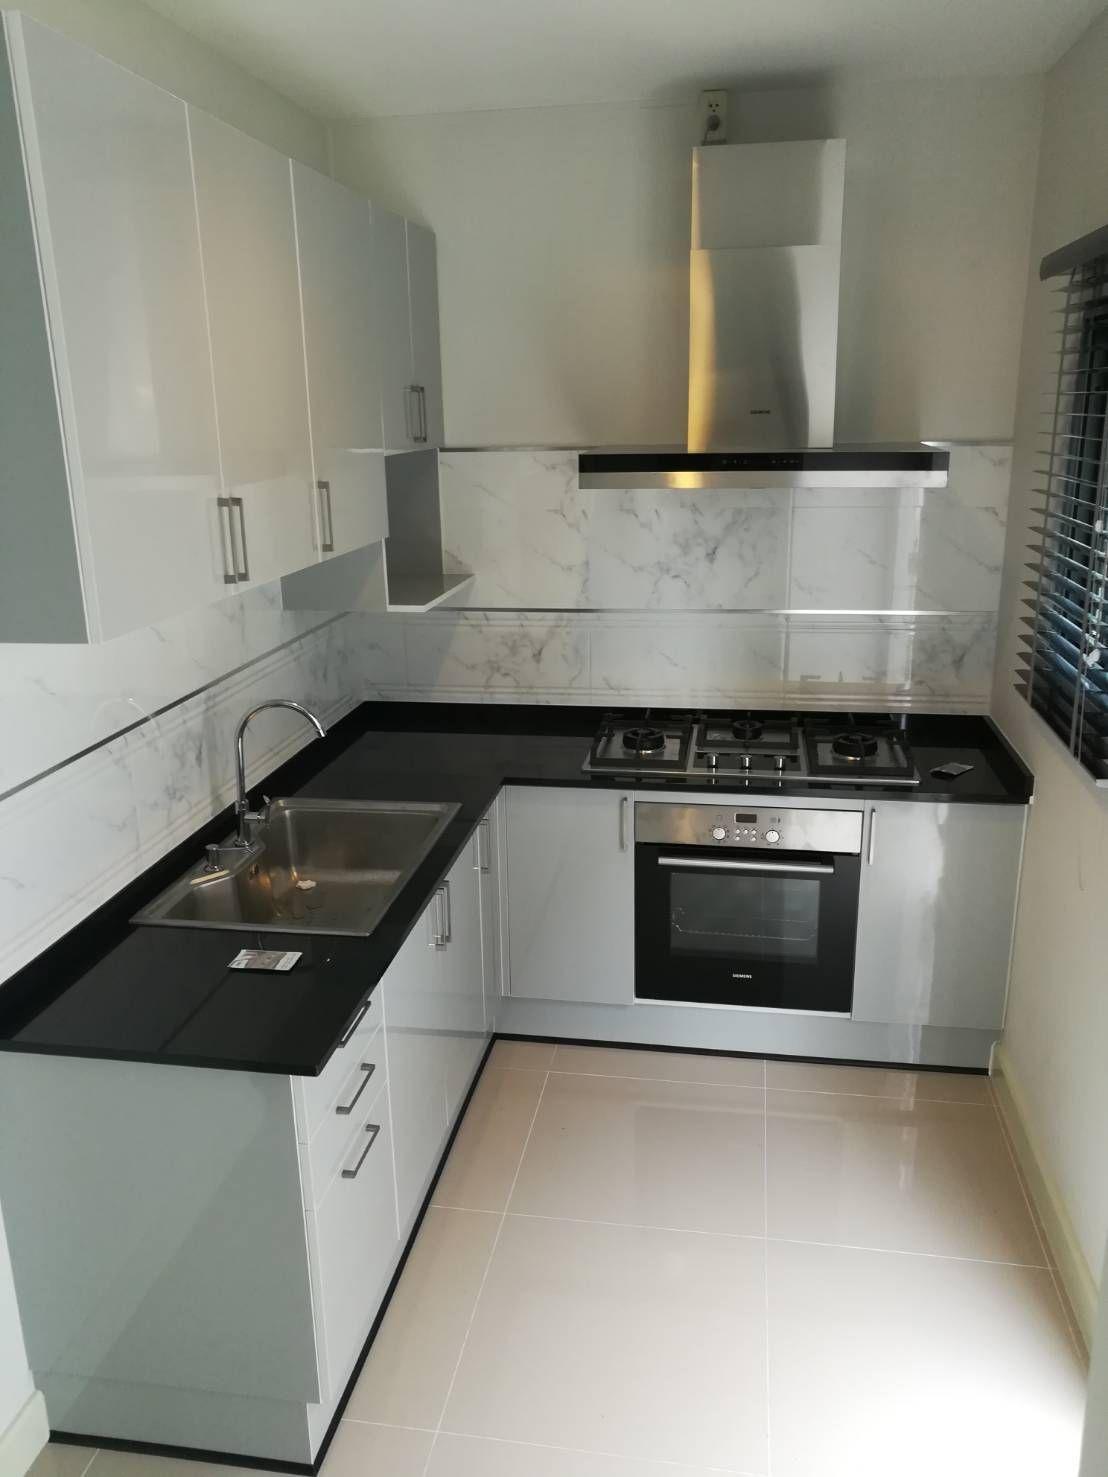 4 Small Apartment Designs Under 50 Square Meters Smallroomdesign Interiordesignofsmallroom S Kitchen Room Design Kitchen Furniture Design Home Decor Kitchen